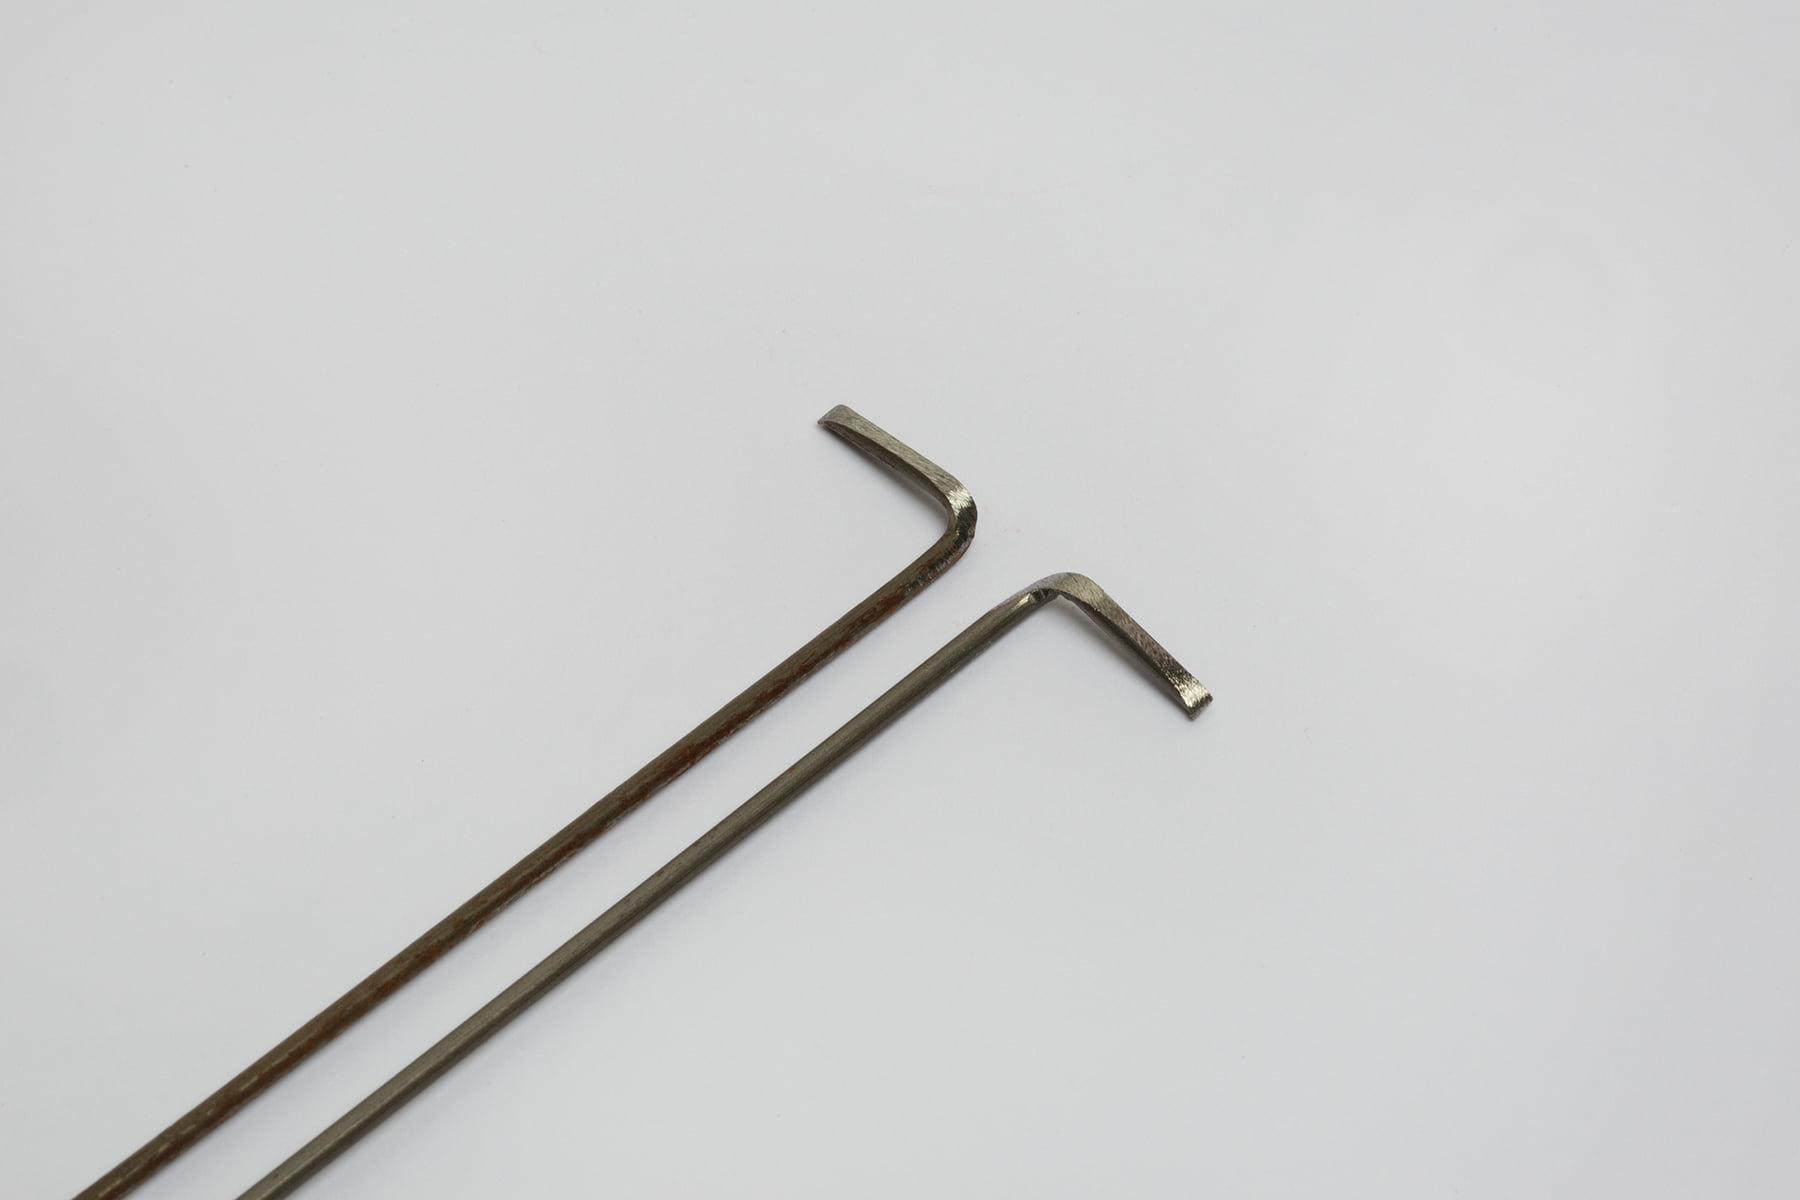 Set of Short Pick Wires